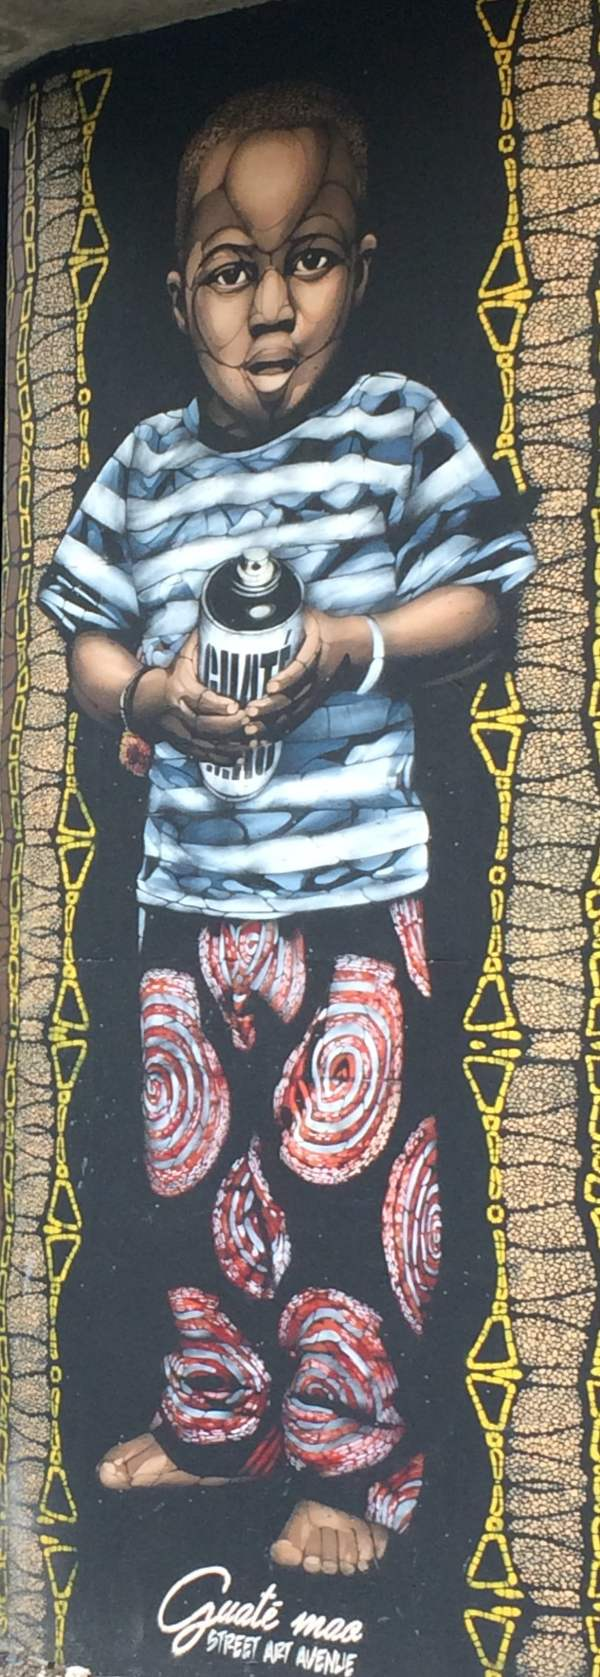 Saint Denis canal street art in Paris: Guate Mao portrait of a boy